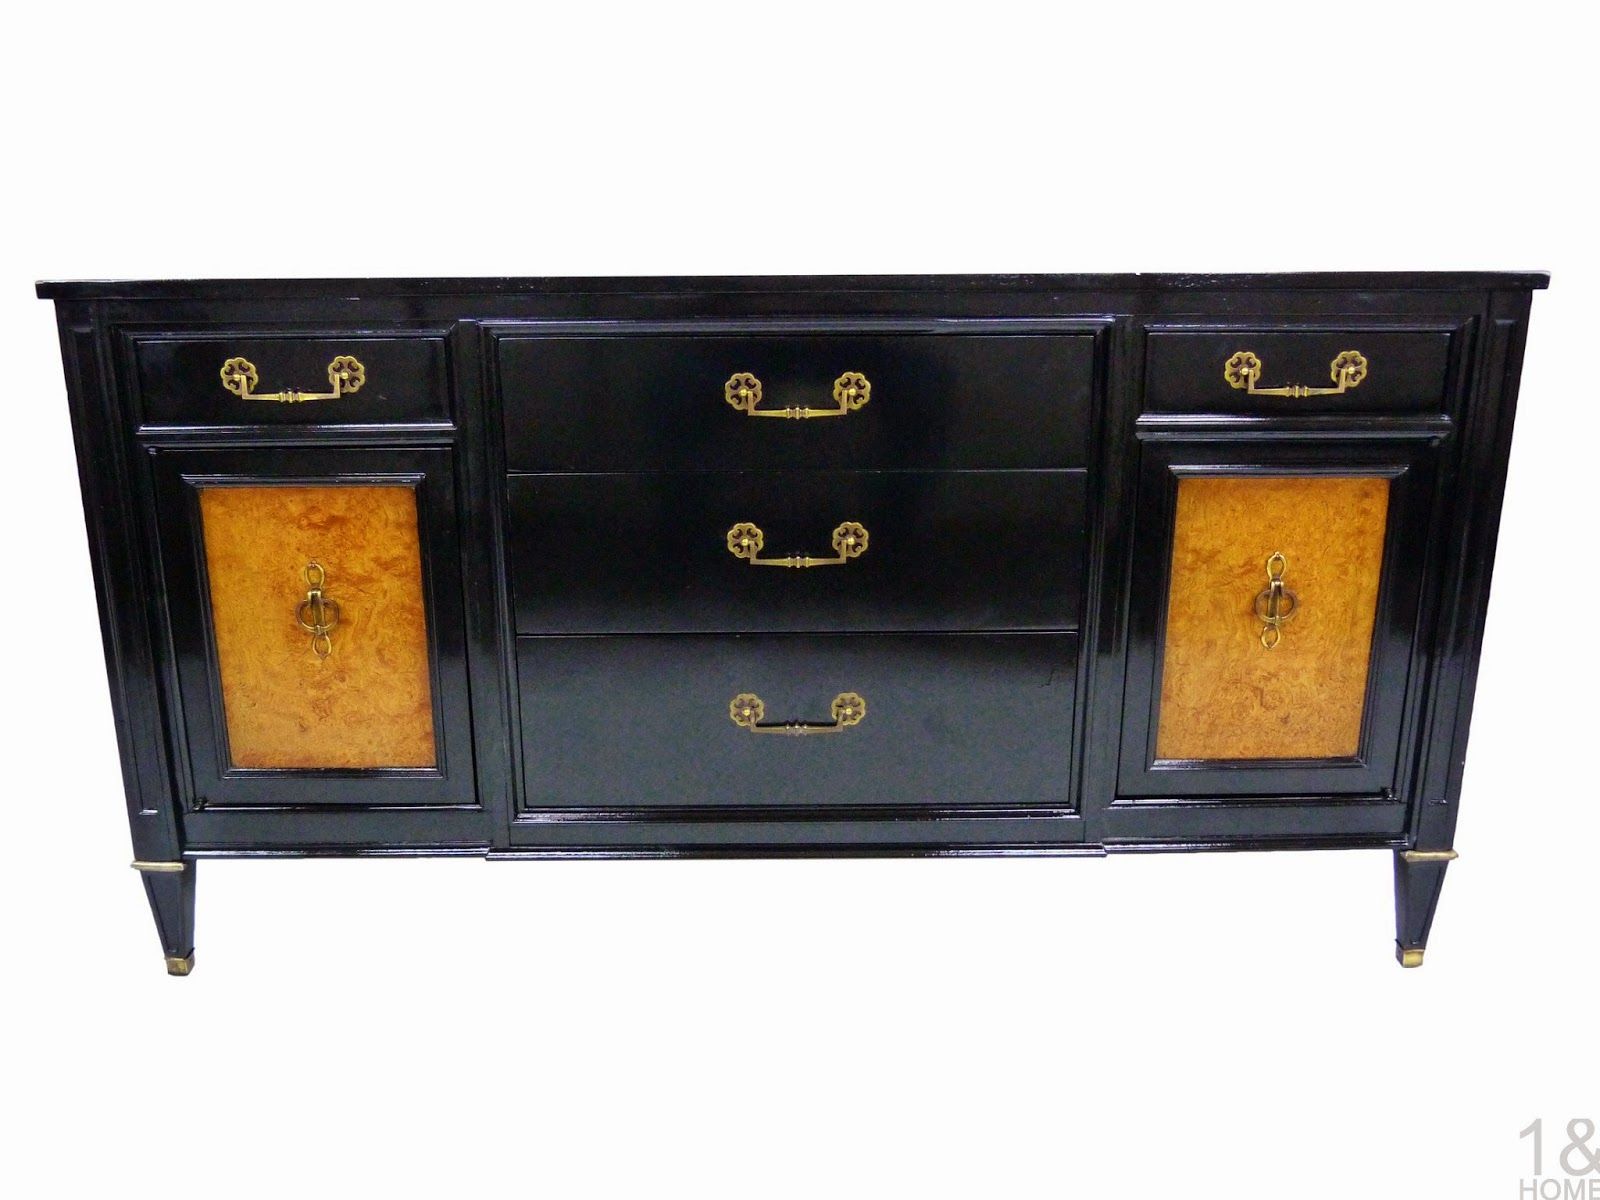 Modern Furniture 2014 modern, mid century, danish, vintage furniture shop, used